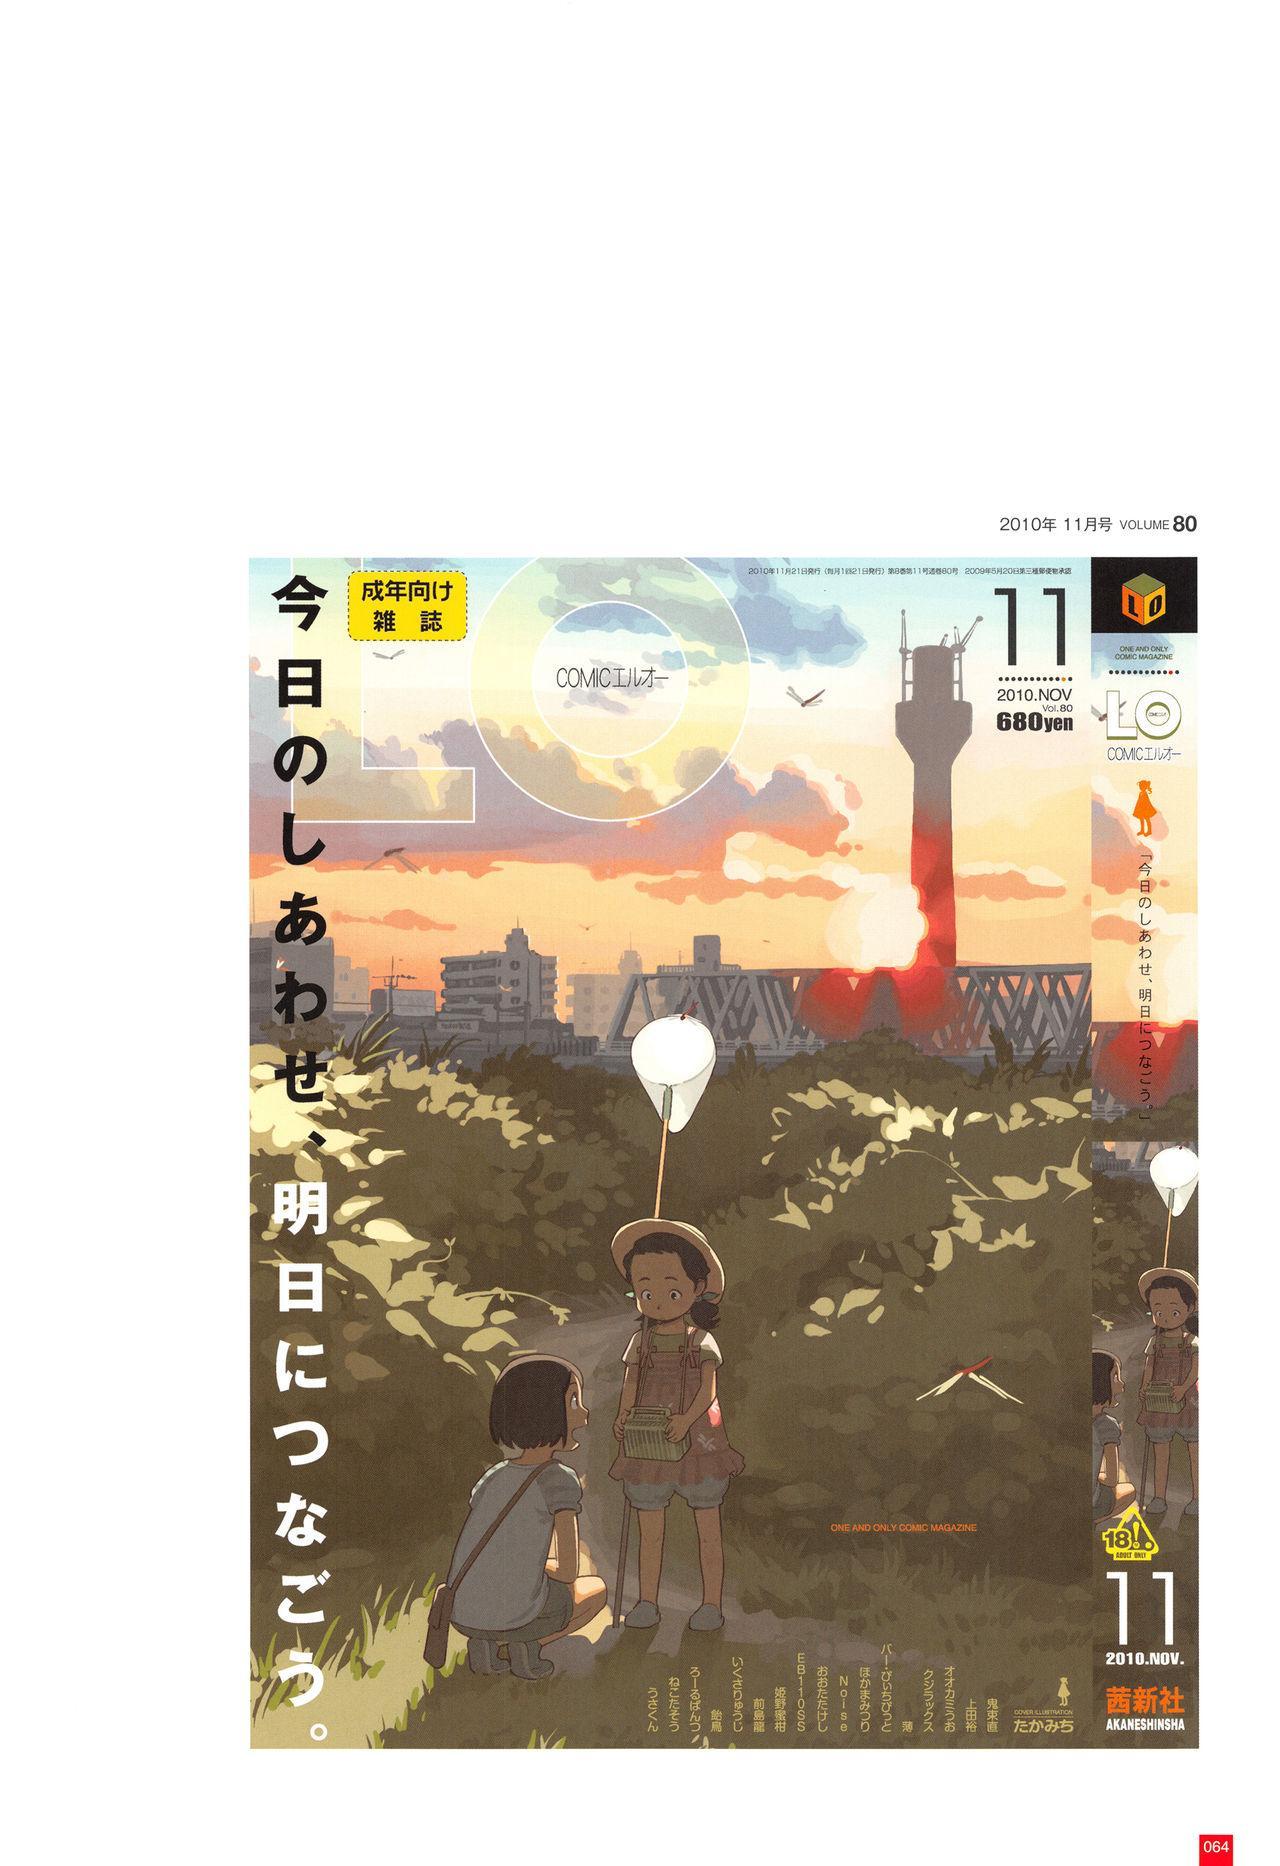 LO Artbook 2-A TAKAMICHI LOOP WORKS 66